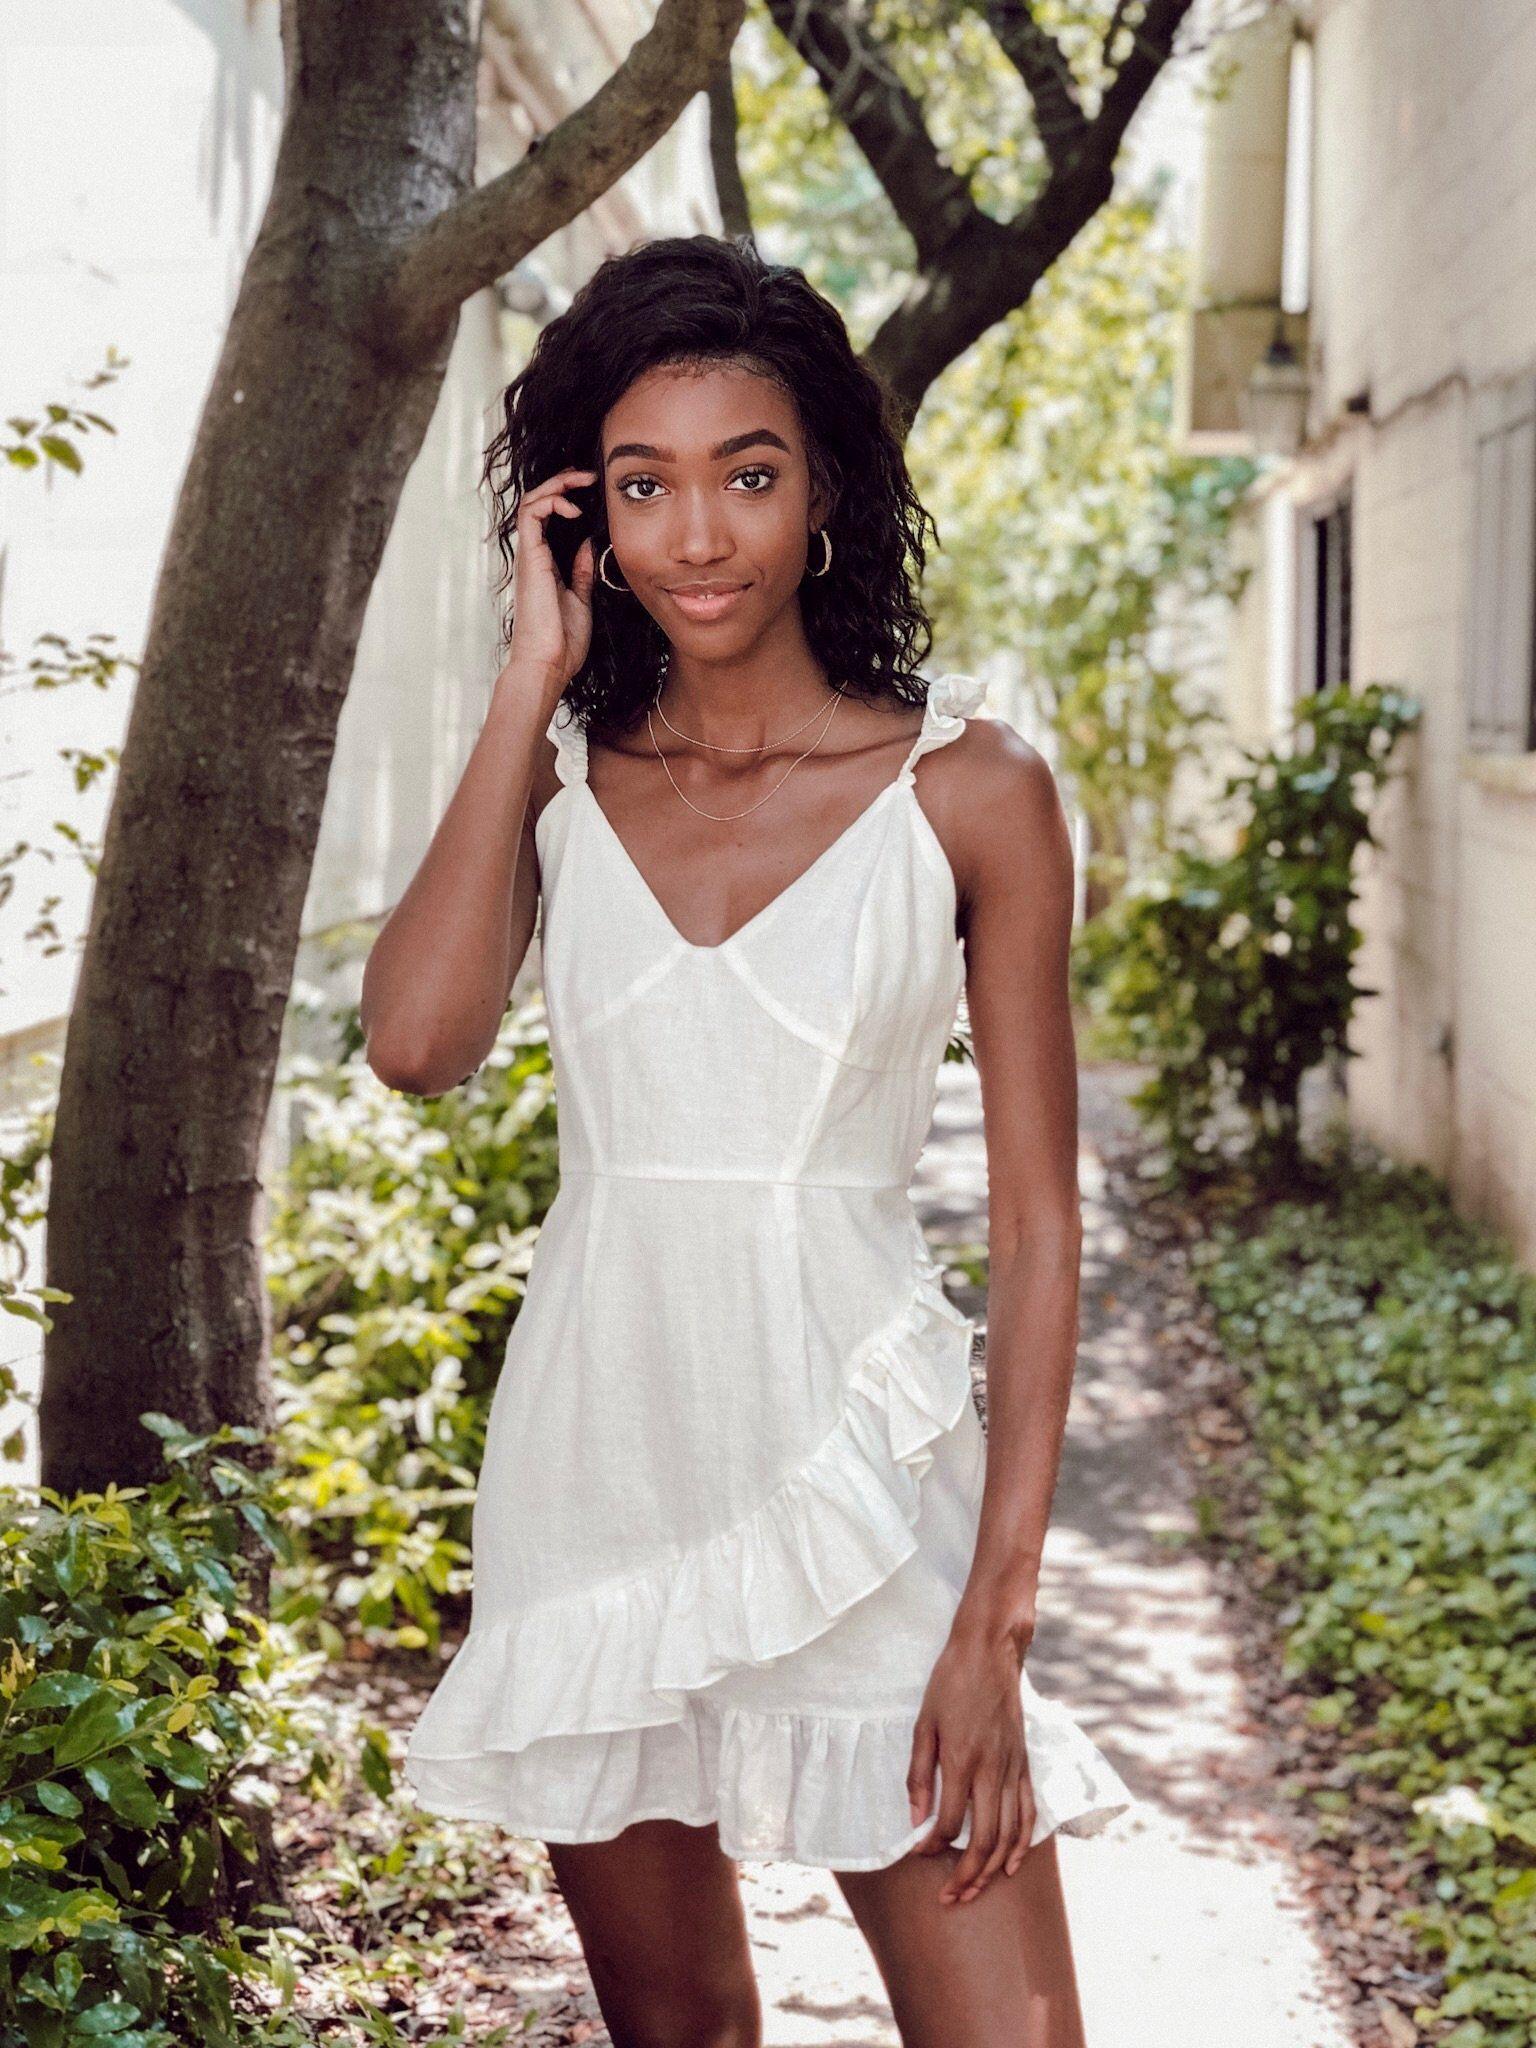 Dresses Outfits Cute Dresses For Summer Cute Outfit Ideas For Summer Beach Outfit Casual Outfits Wome Bridal Shower Dress Bridal Shower Outfit White Bridal [ 2048 x 1536 Pixel ]